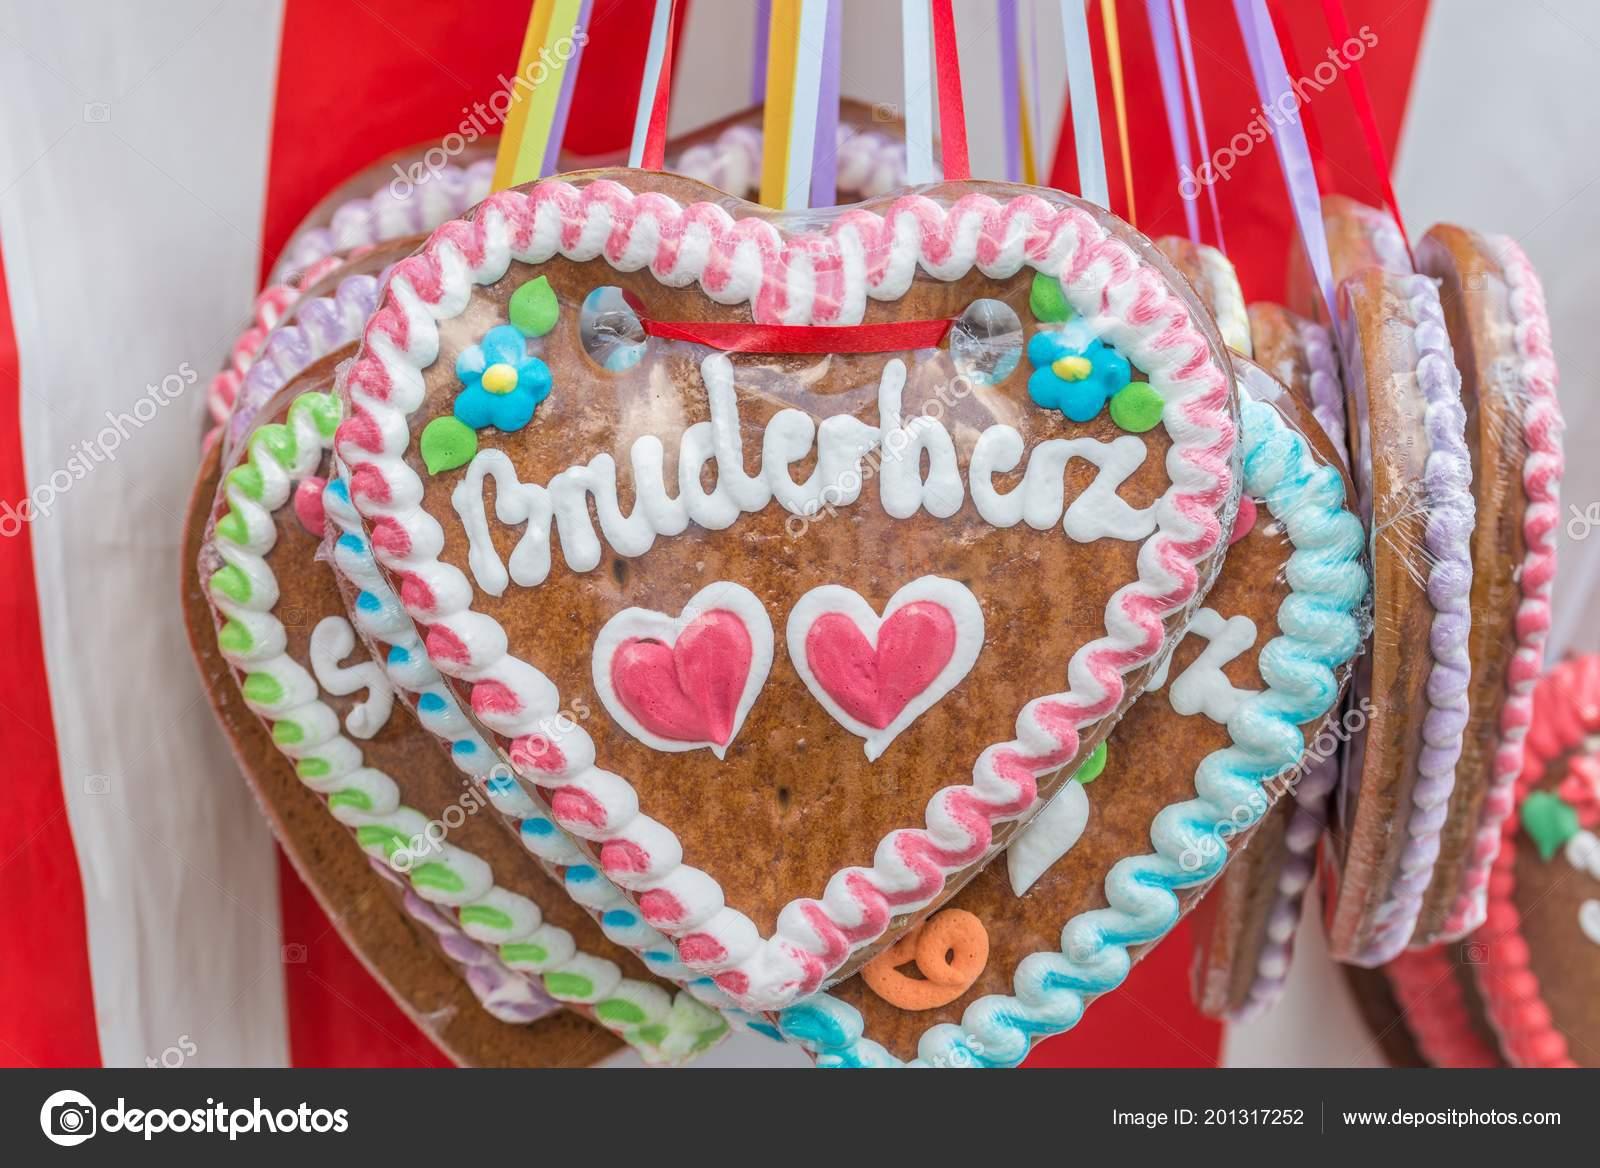 Gingerbread Hearts Folk Festival German Words Brother Heart Germany